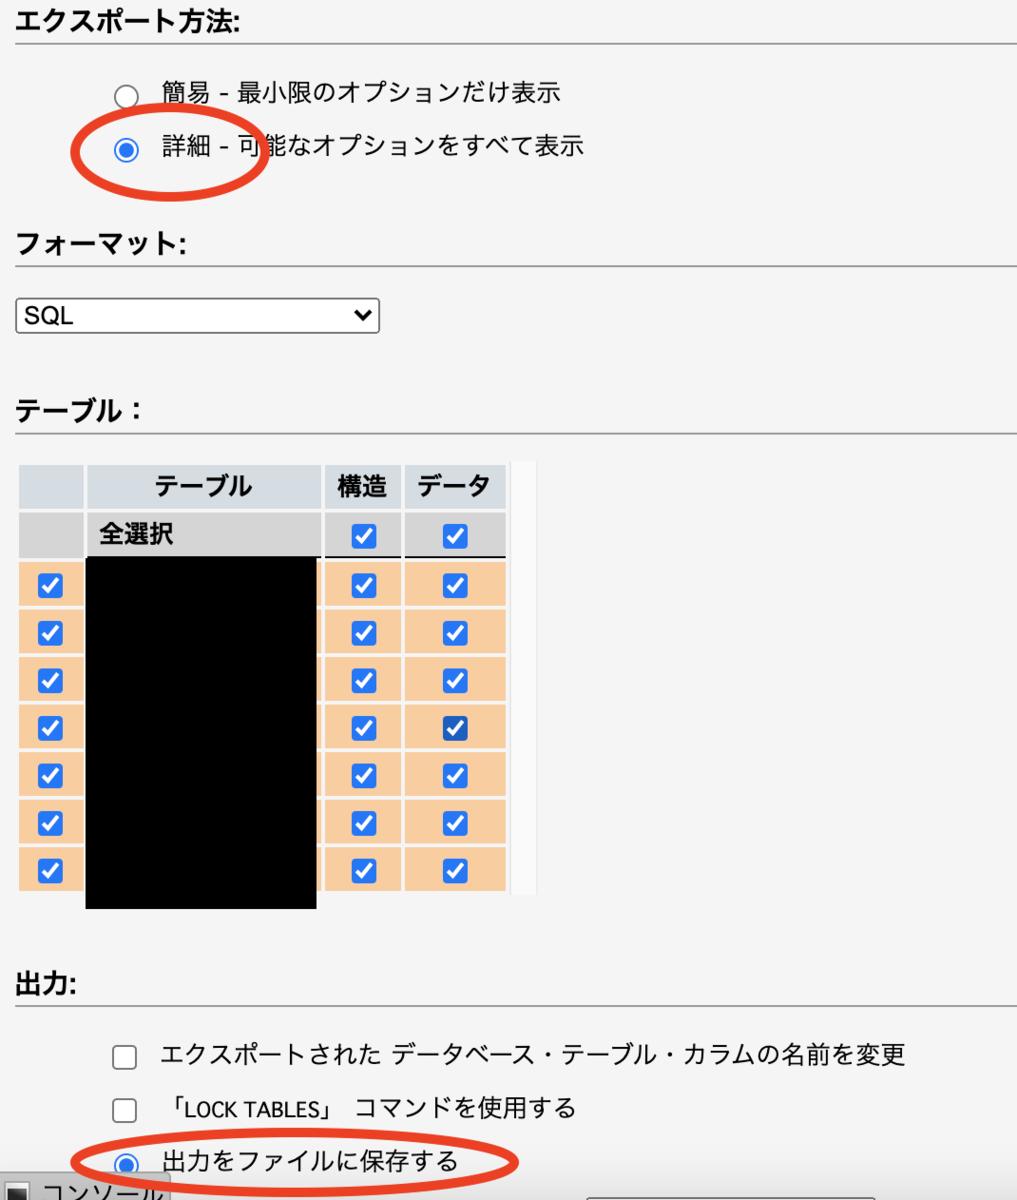 f:id:yamata214:20210308120740p:plain